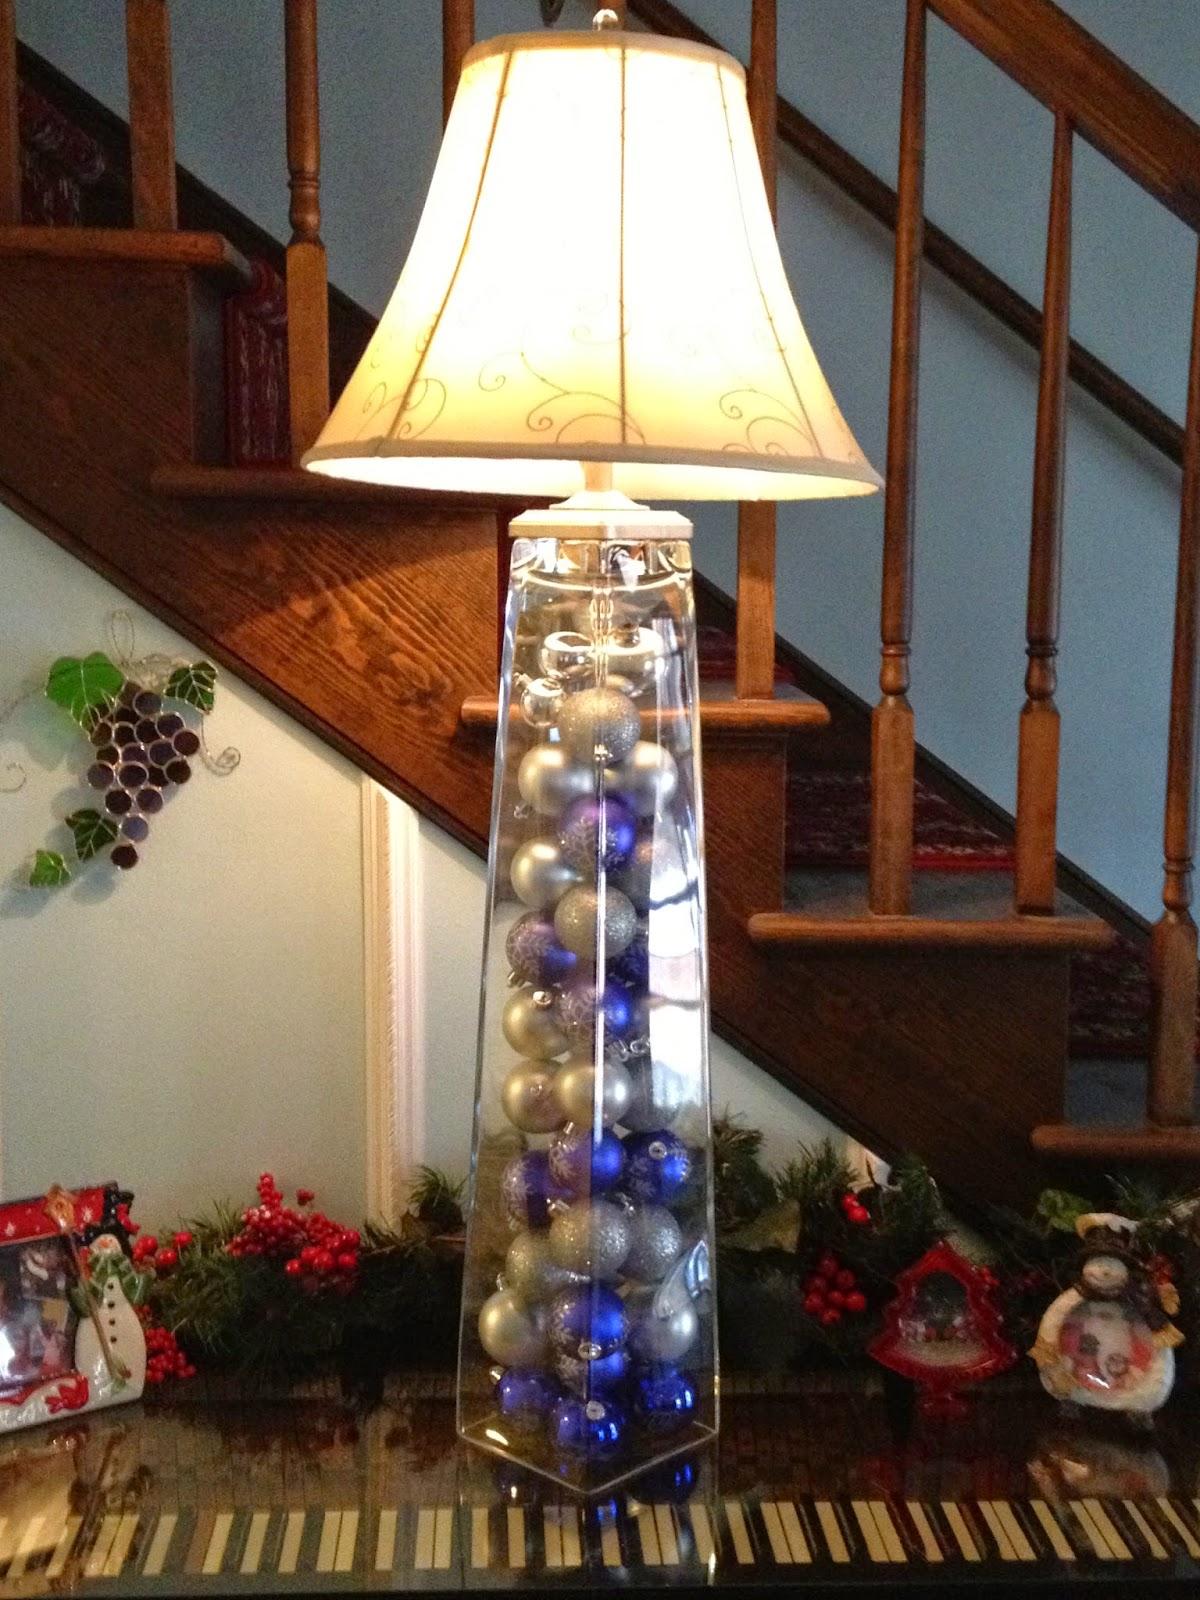 Making A Lamp From A Vase | Shapeyourminds.com on diy bottle lamp, diy moon lamp, diy flower lamp, diy jewelry lamp, diy jug lamp, diy christmas lamp, diy toy lamp, diy figurine lamp, diy ribbon lamp, diy butterfly lamp, diy doll lamp, diy pendant lamp, diy book lamp, diy plant lamp, diy tree lamp, diy bed lamp, diy art deco lamp, diy chandelier lamp, diy vintage lamp, diy box lamp,